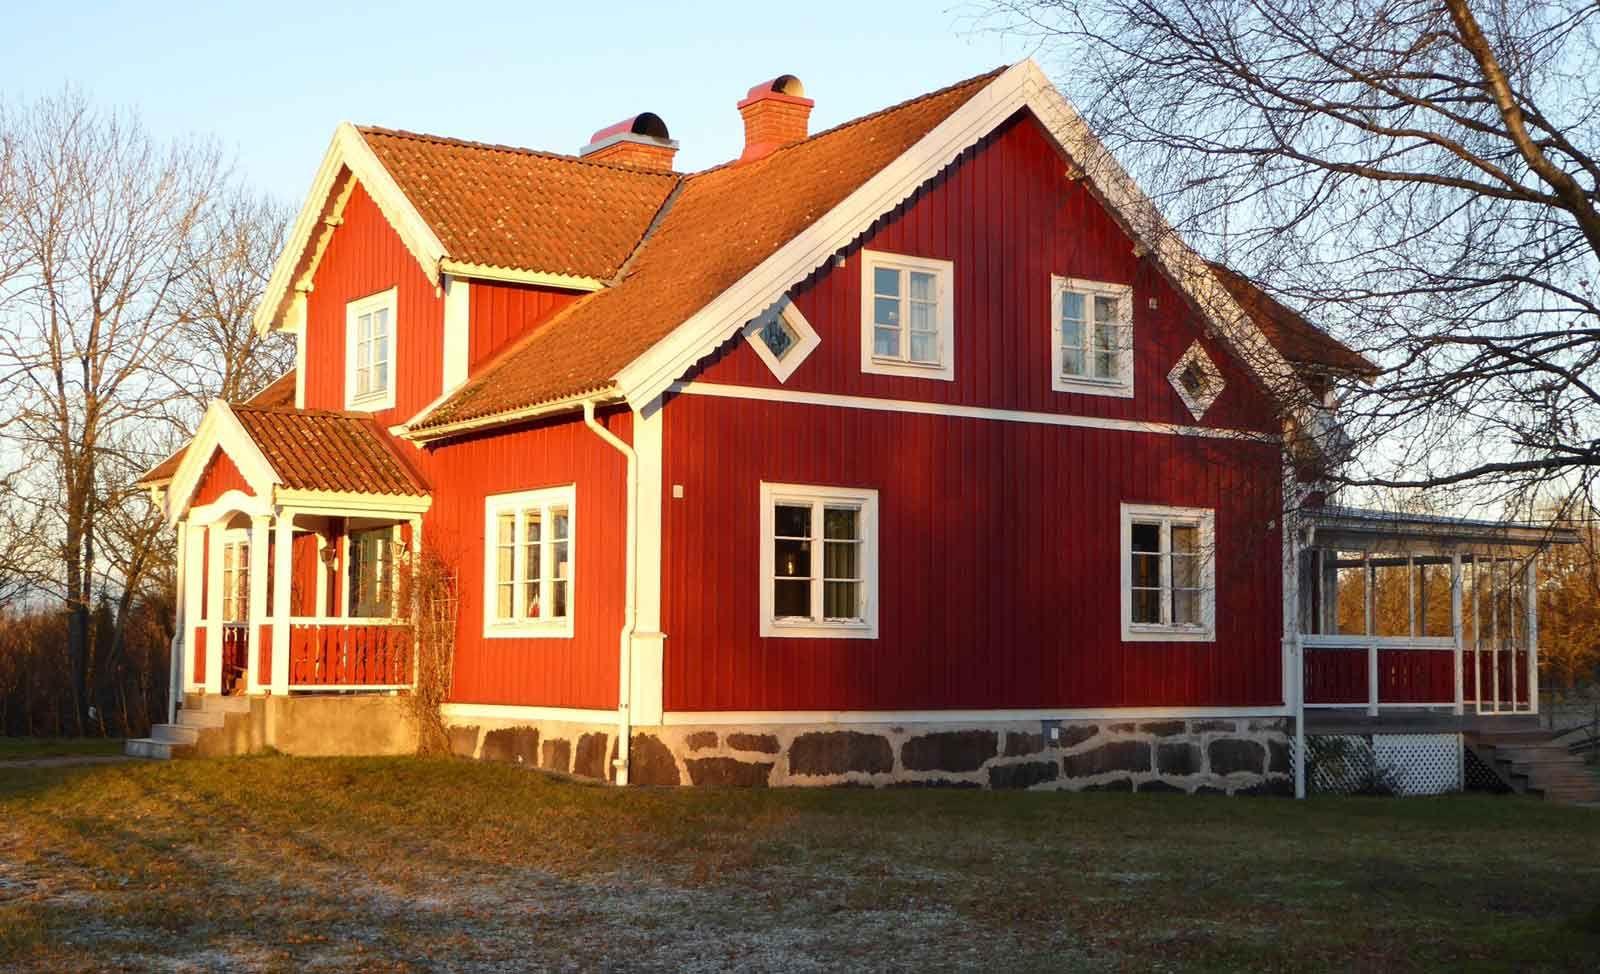 Ferienhaus am See Åsnen, Almen, Urshult, Tingsryd, Smaland